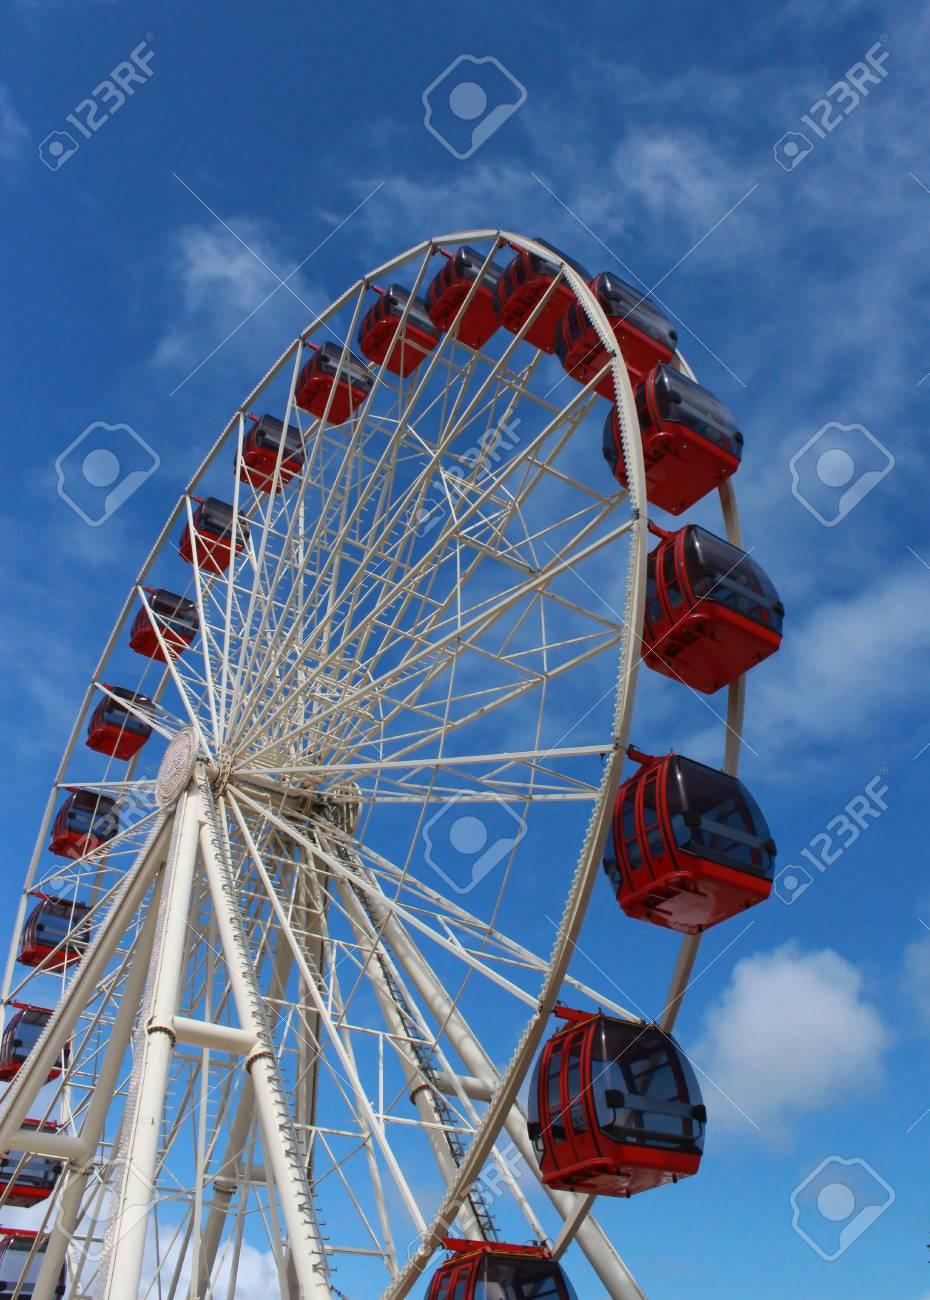 Ferris wheel at amusement park against blue sky Stock Photo - 23320241